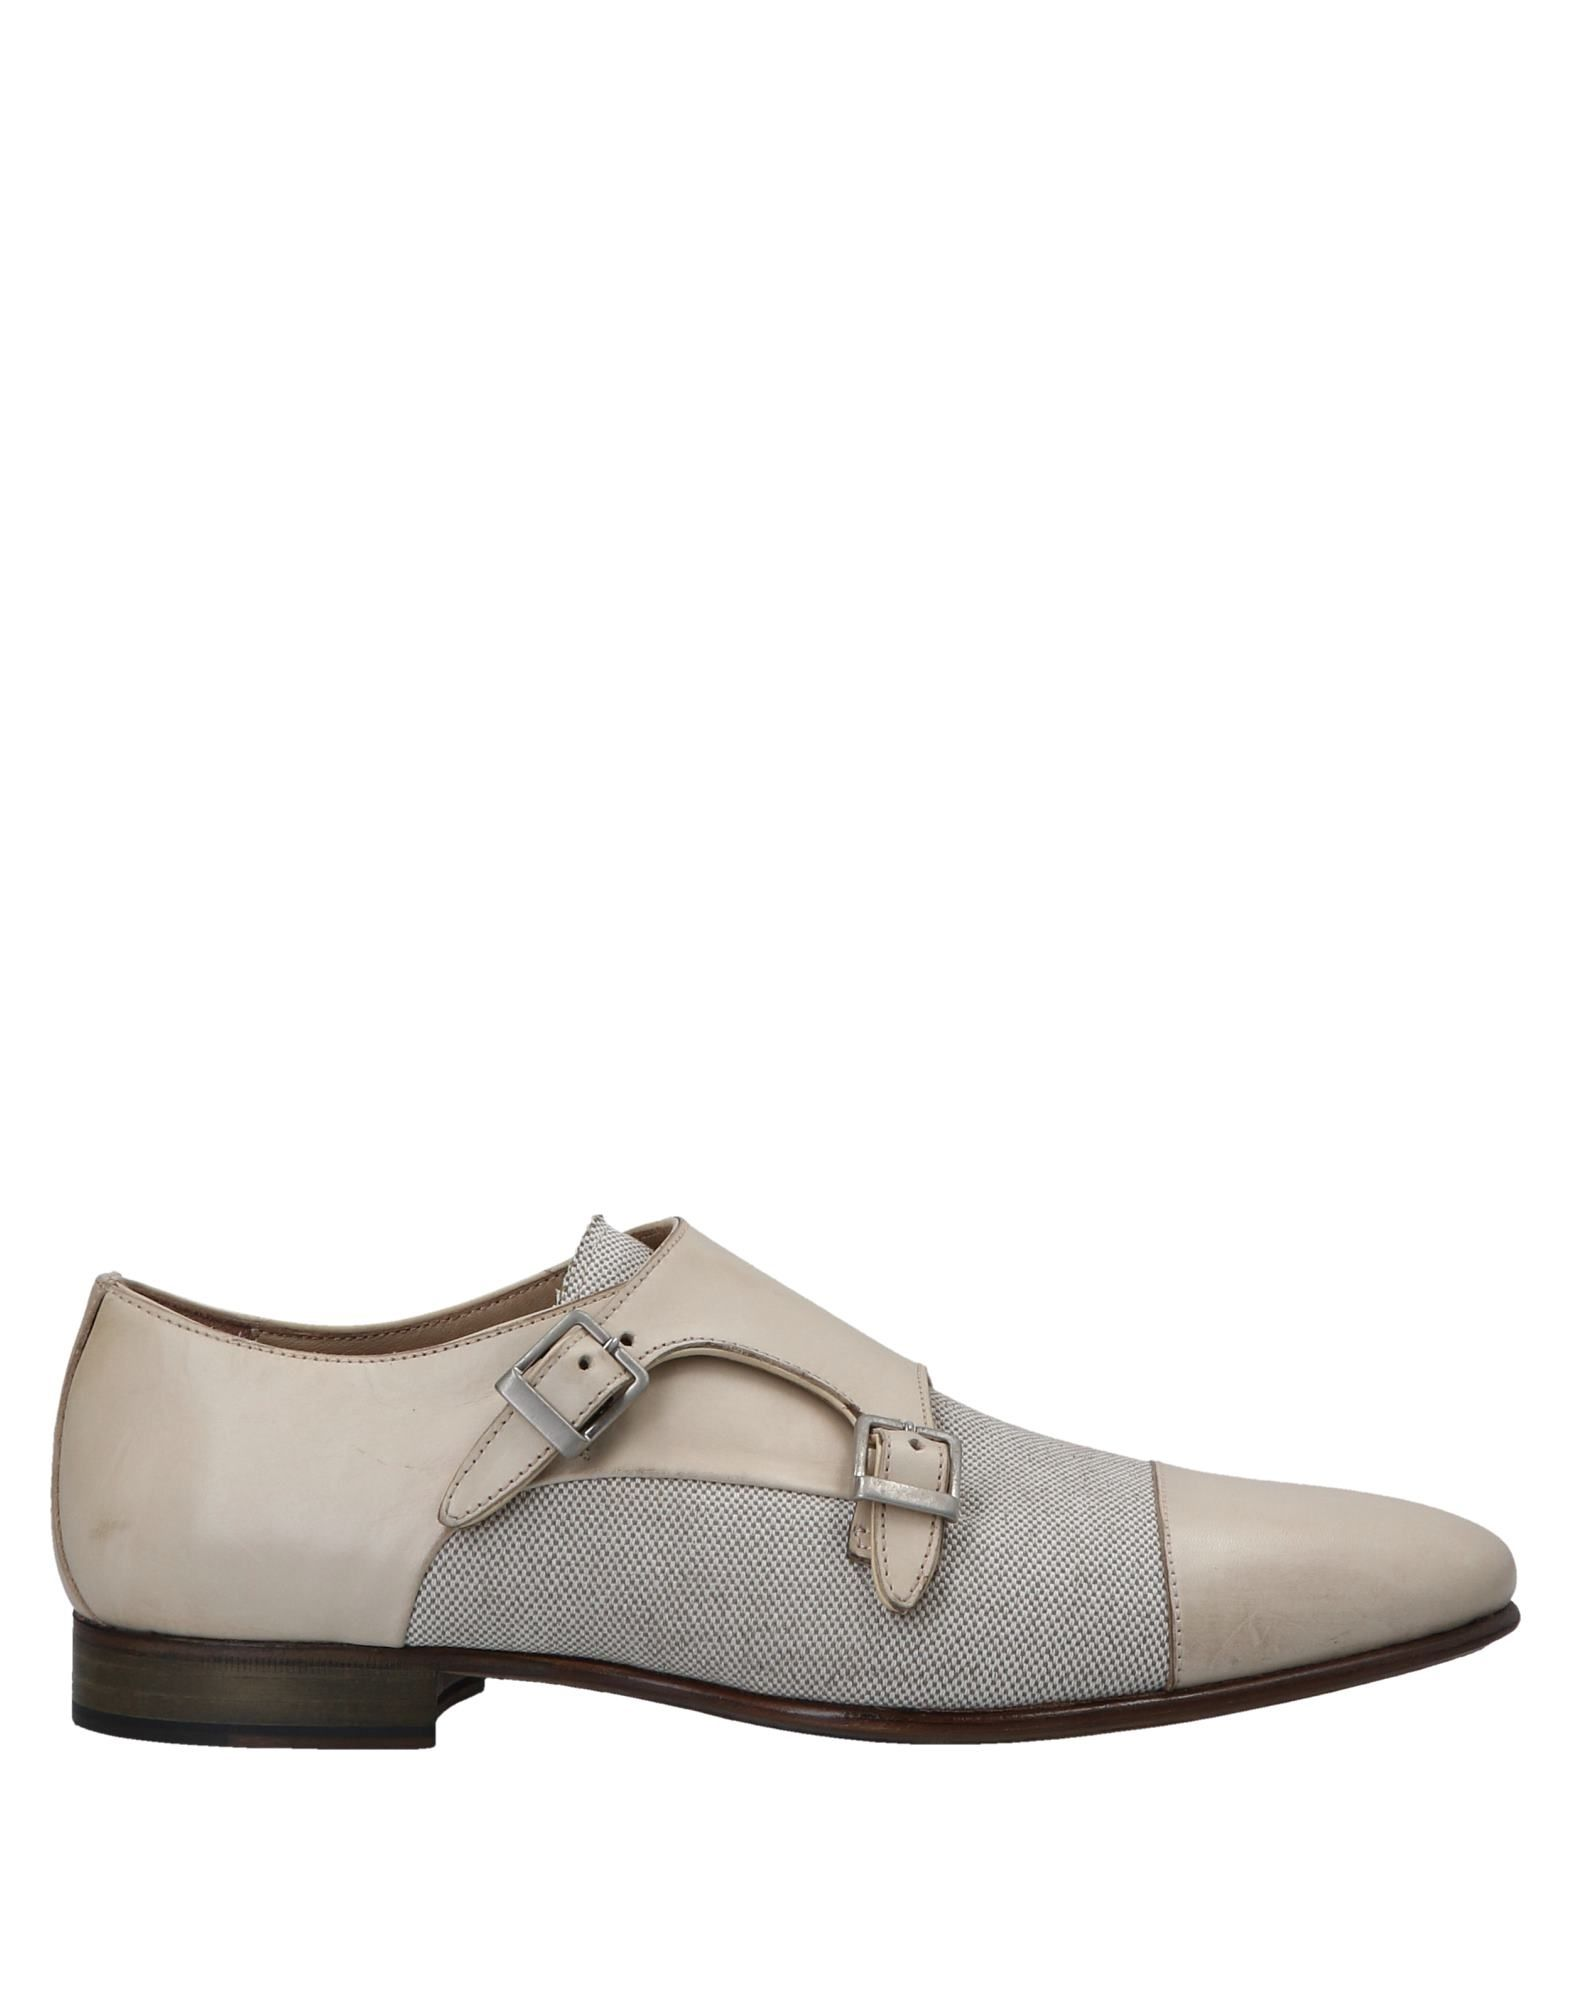 Calpierre Mokassins Herren  11551897LN Gute Qualität beliebte Schuhe